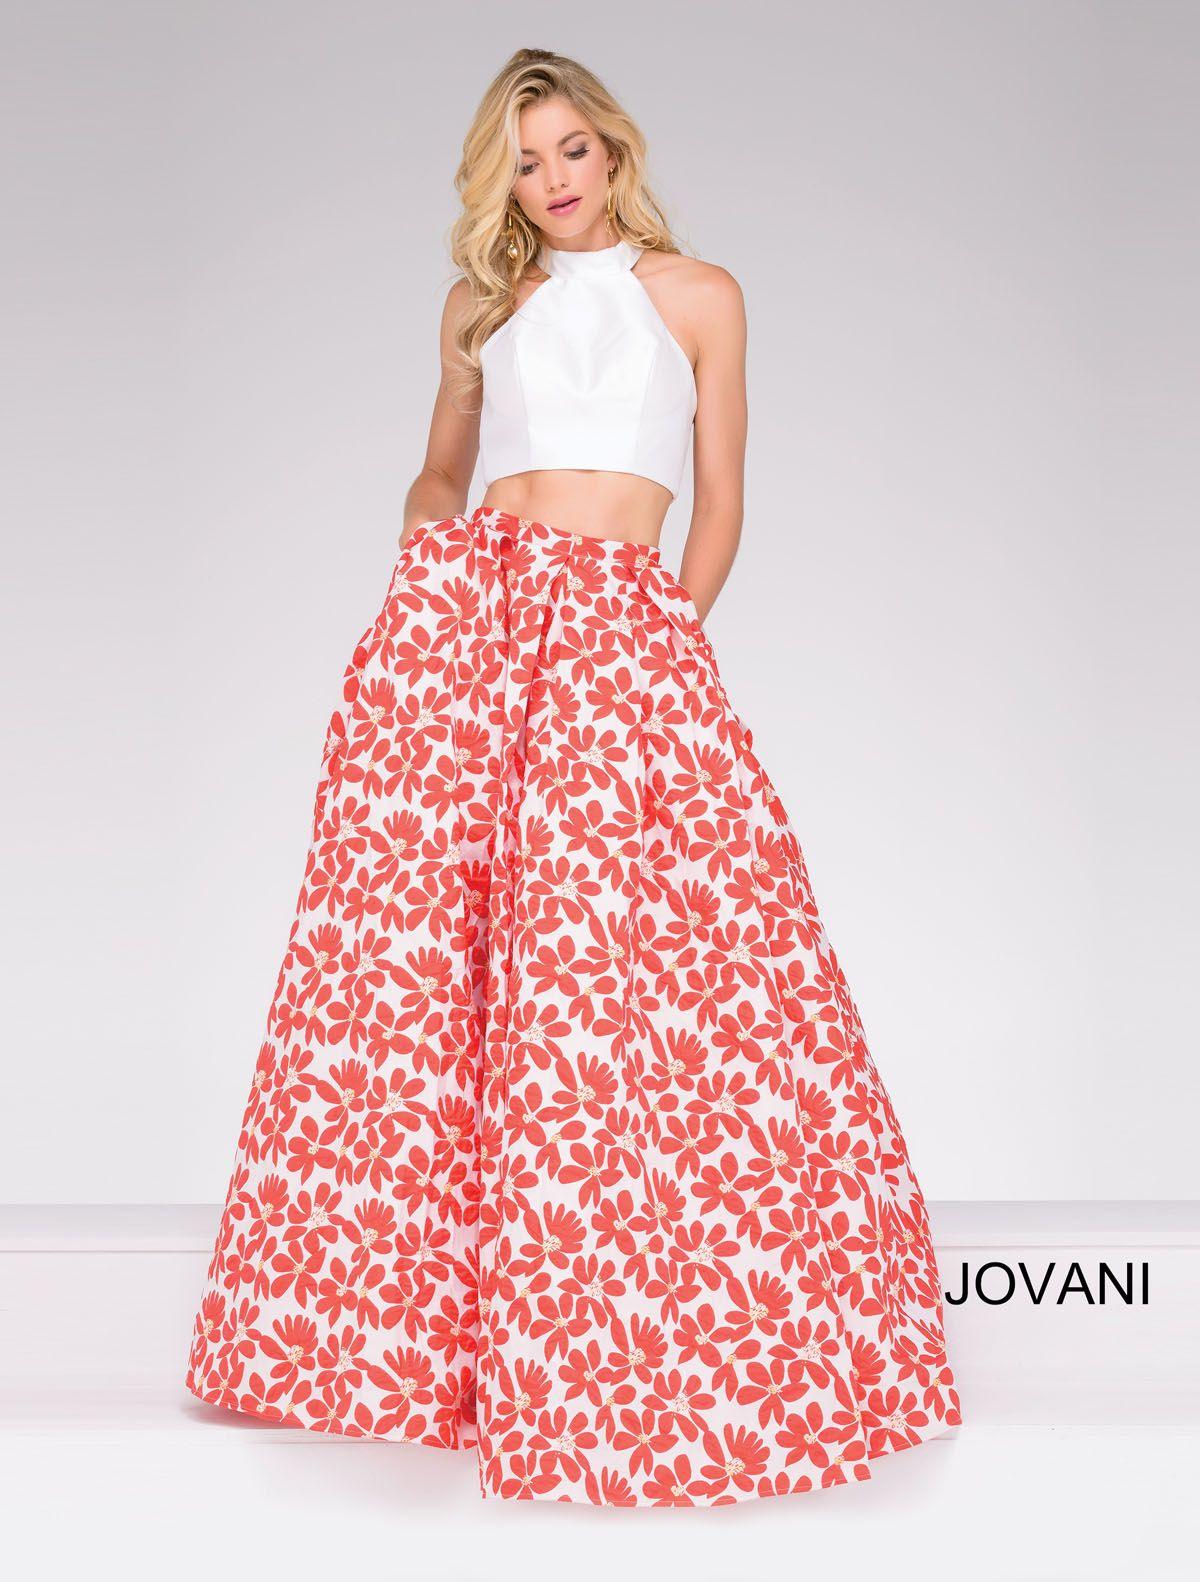 Jovani 48948 - International Prom Association | Jovani Prom Dresses ...